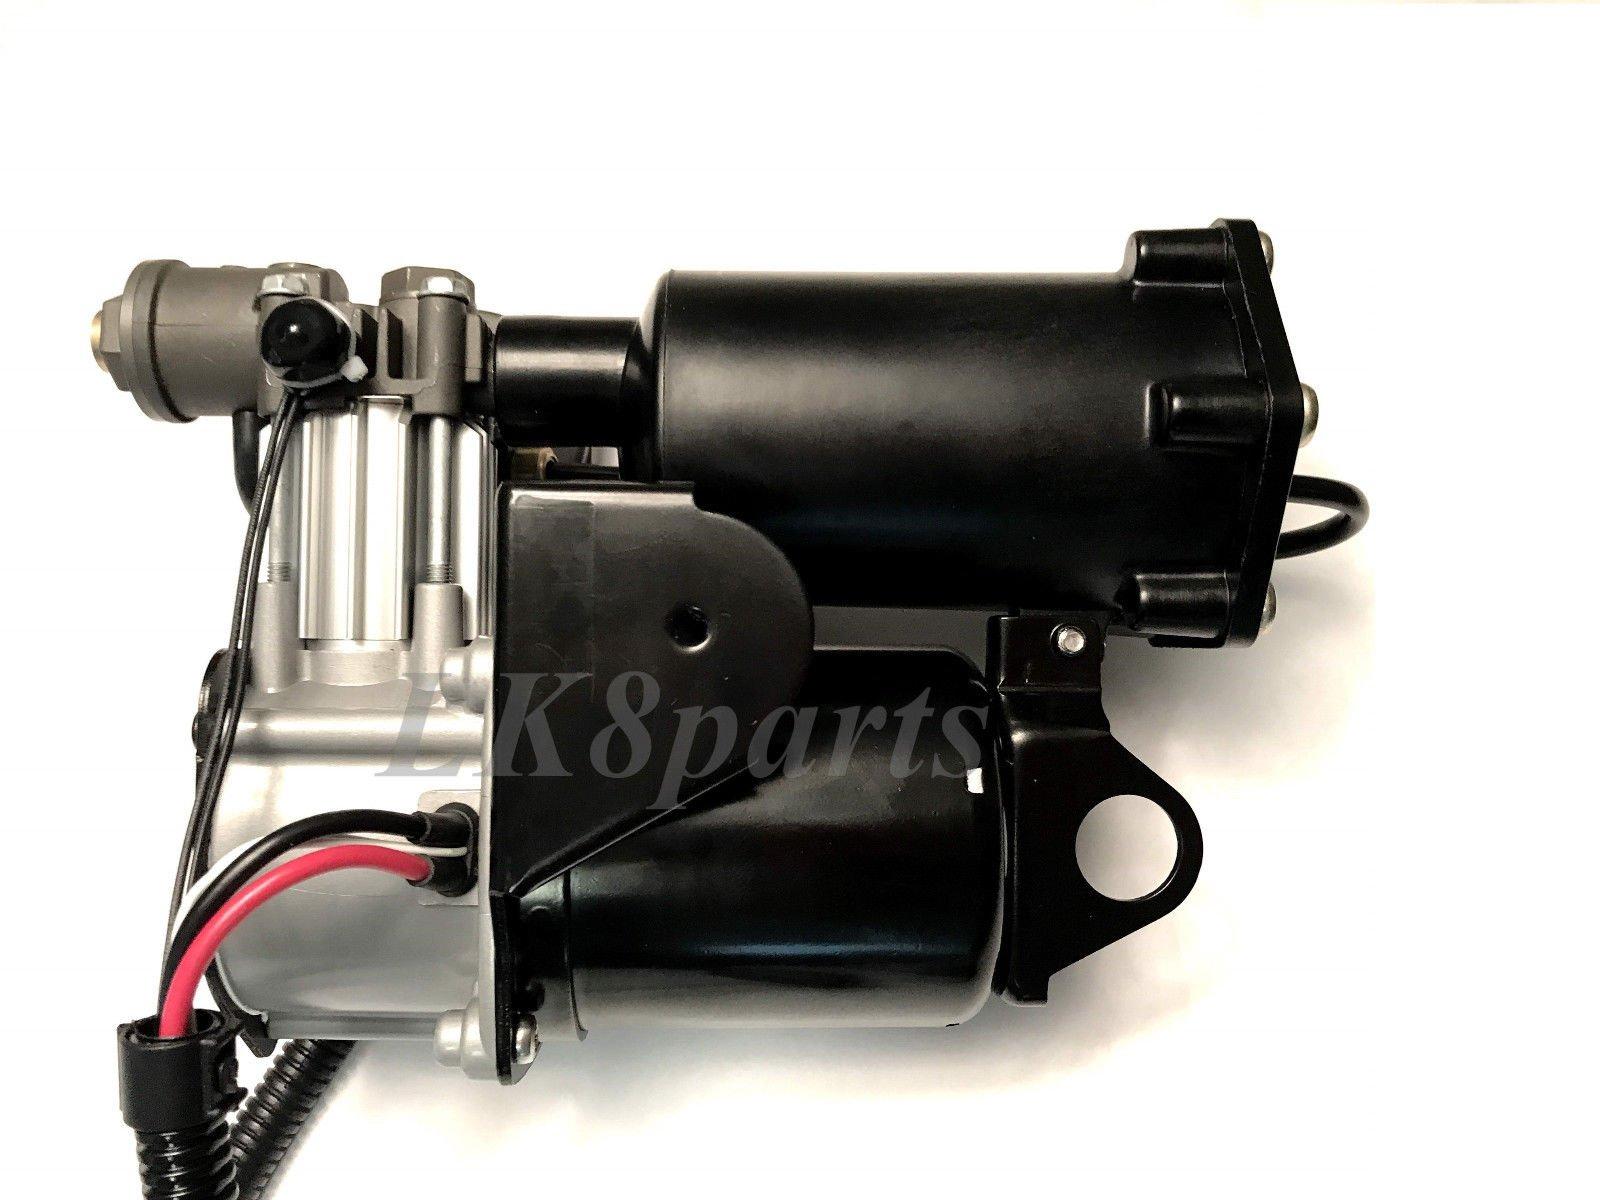 Land Rover Range Rover Sport LR3 HD Long Life Compressor Suspension Air Compressor by Proper Spec (Image #2)